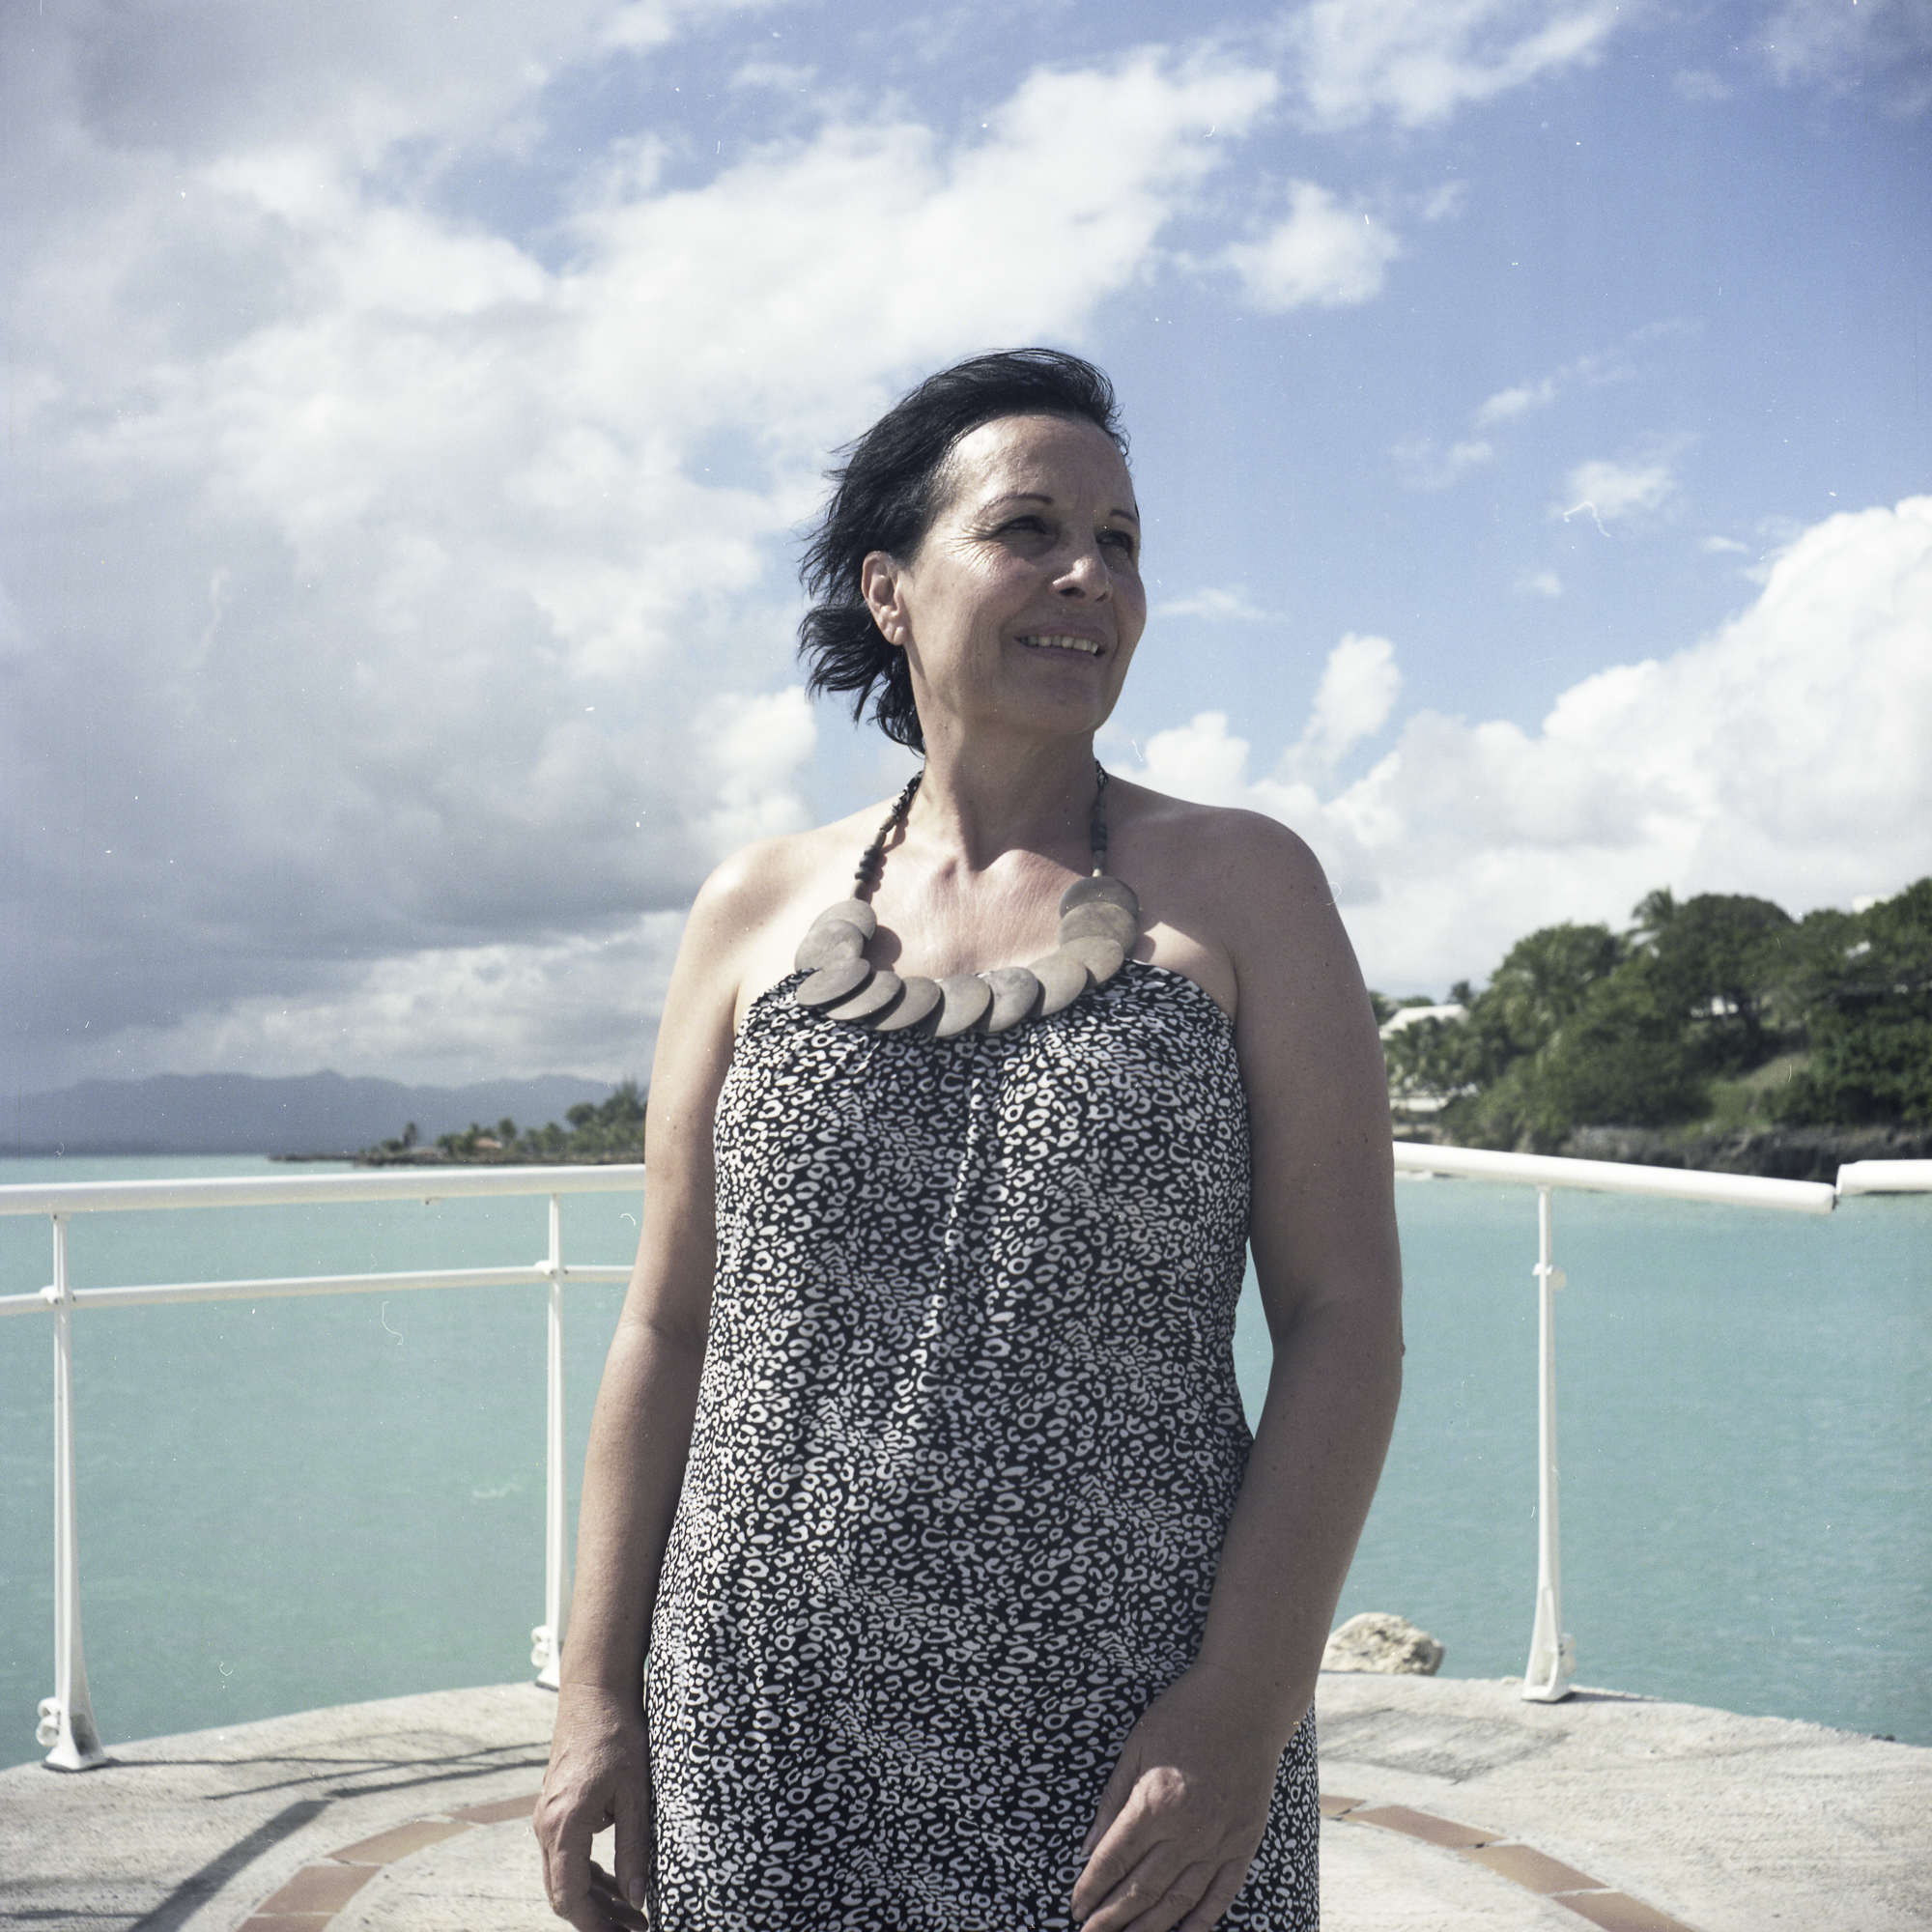 (c) Priscilla Stanley - Portraits8